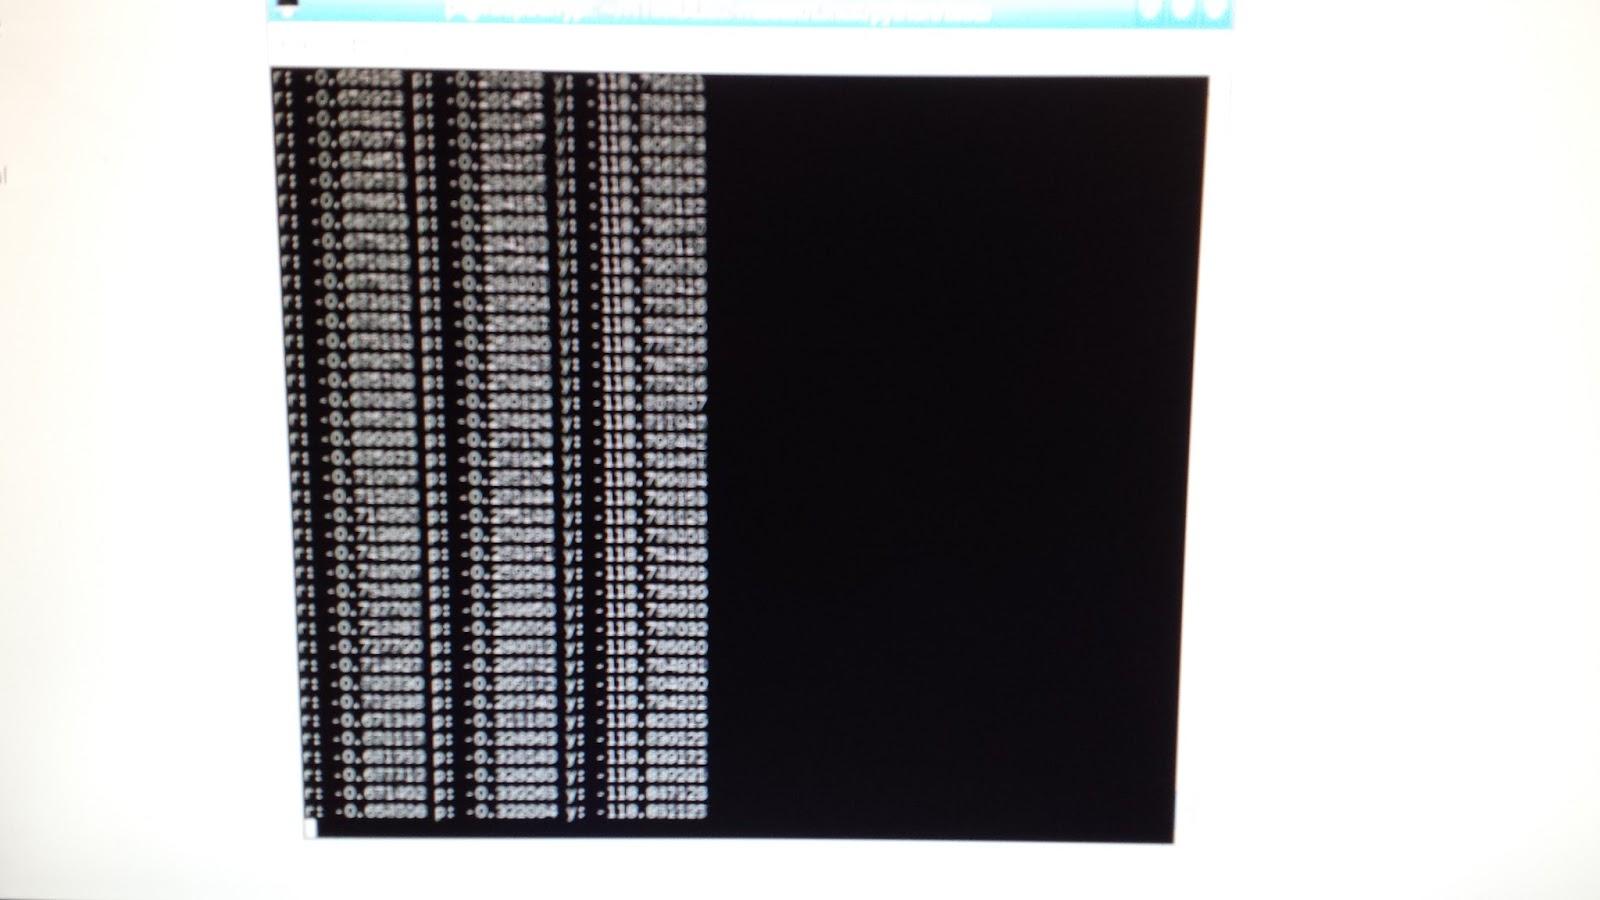 CraigDavis78: Adafruit 10-DOF IMU: Getting It to work on Raspberry